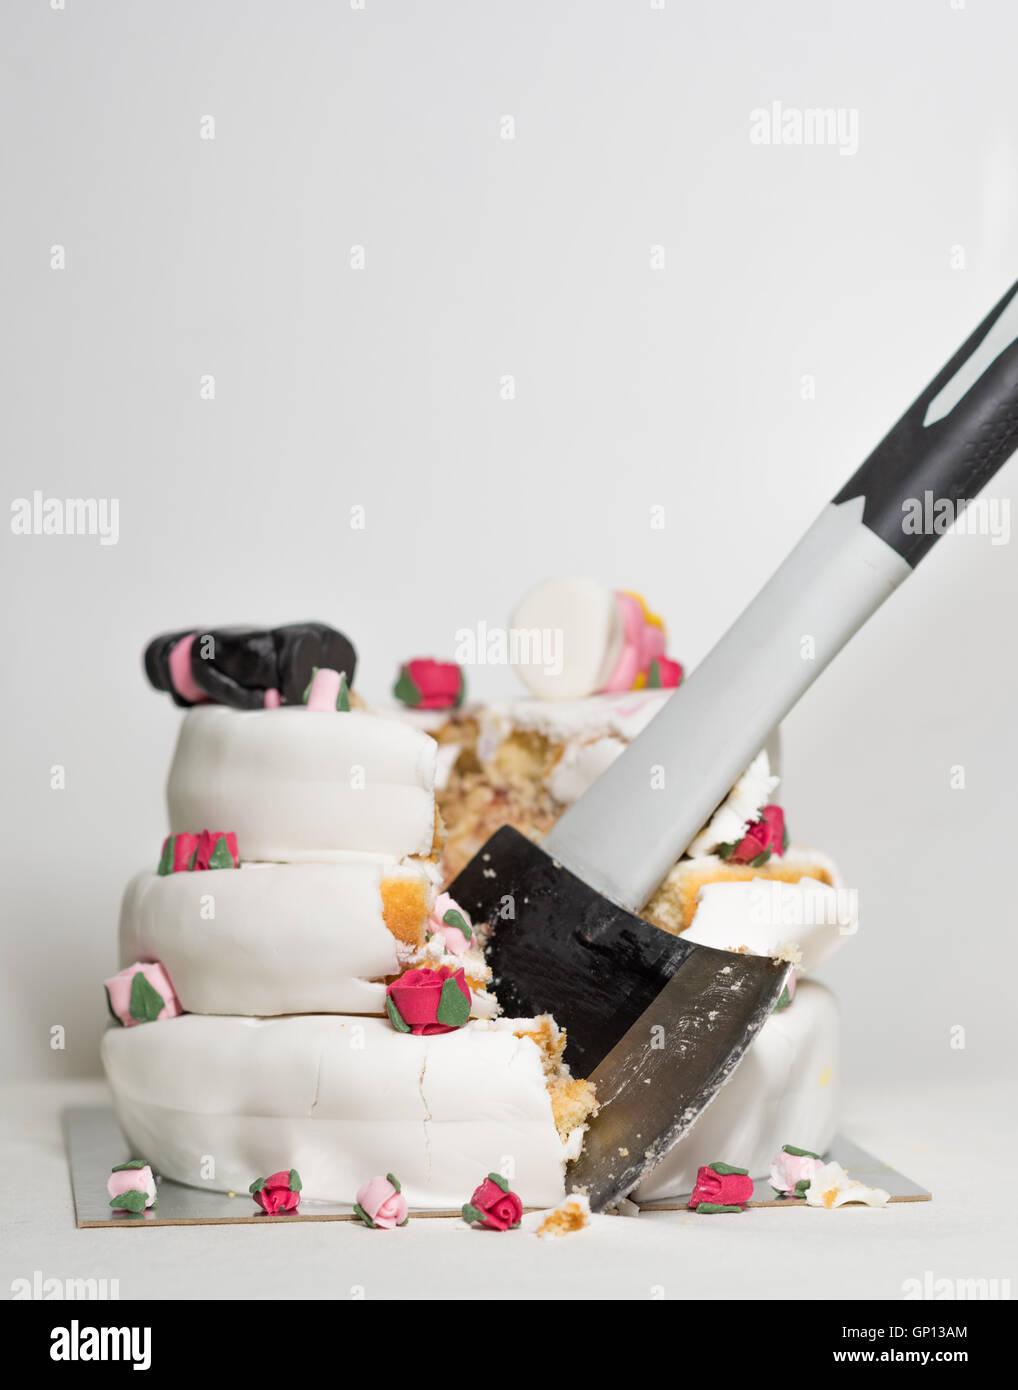 Destroyed Cake Stock Photos & Destroyed Cake Stock Images - Alamy